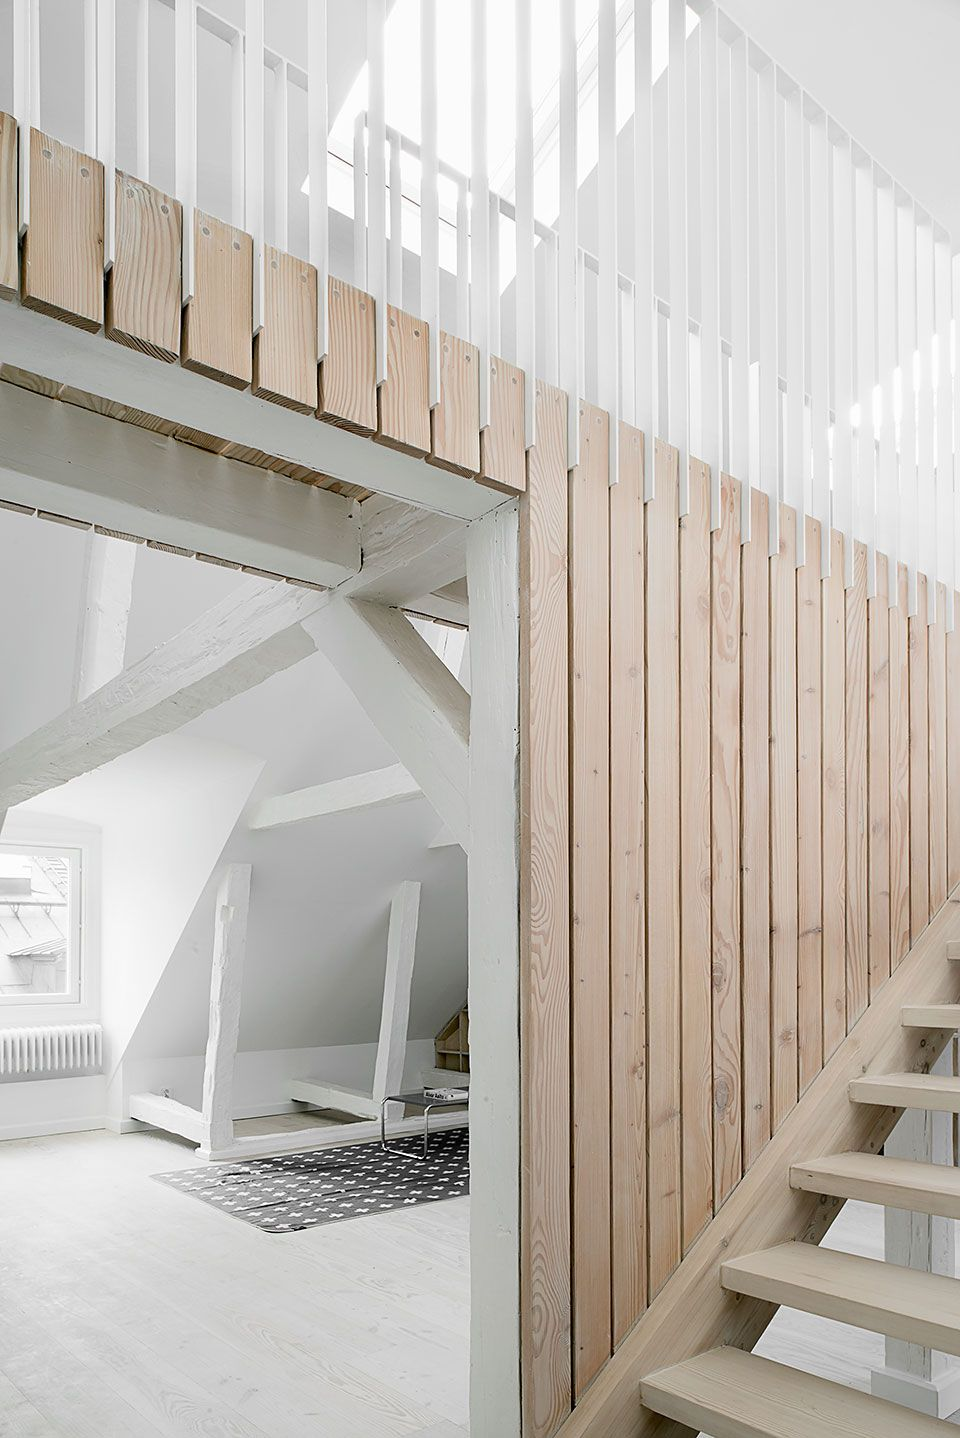 Design Interior Stairs Arch Wood Cladding Railings Stair Handrail